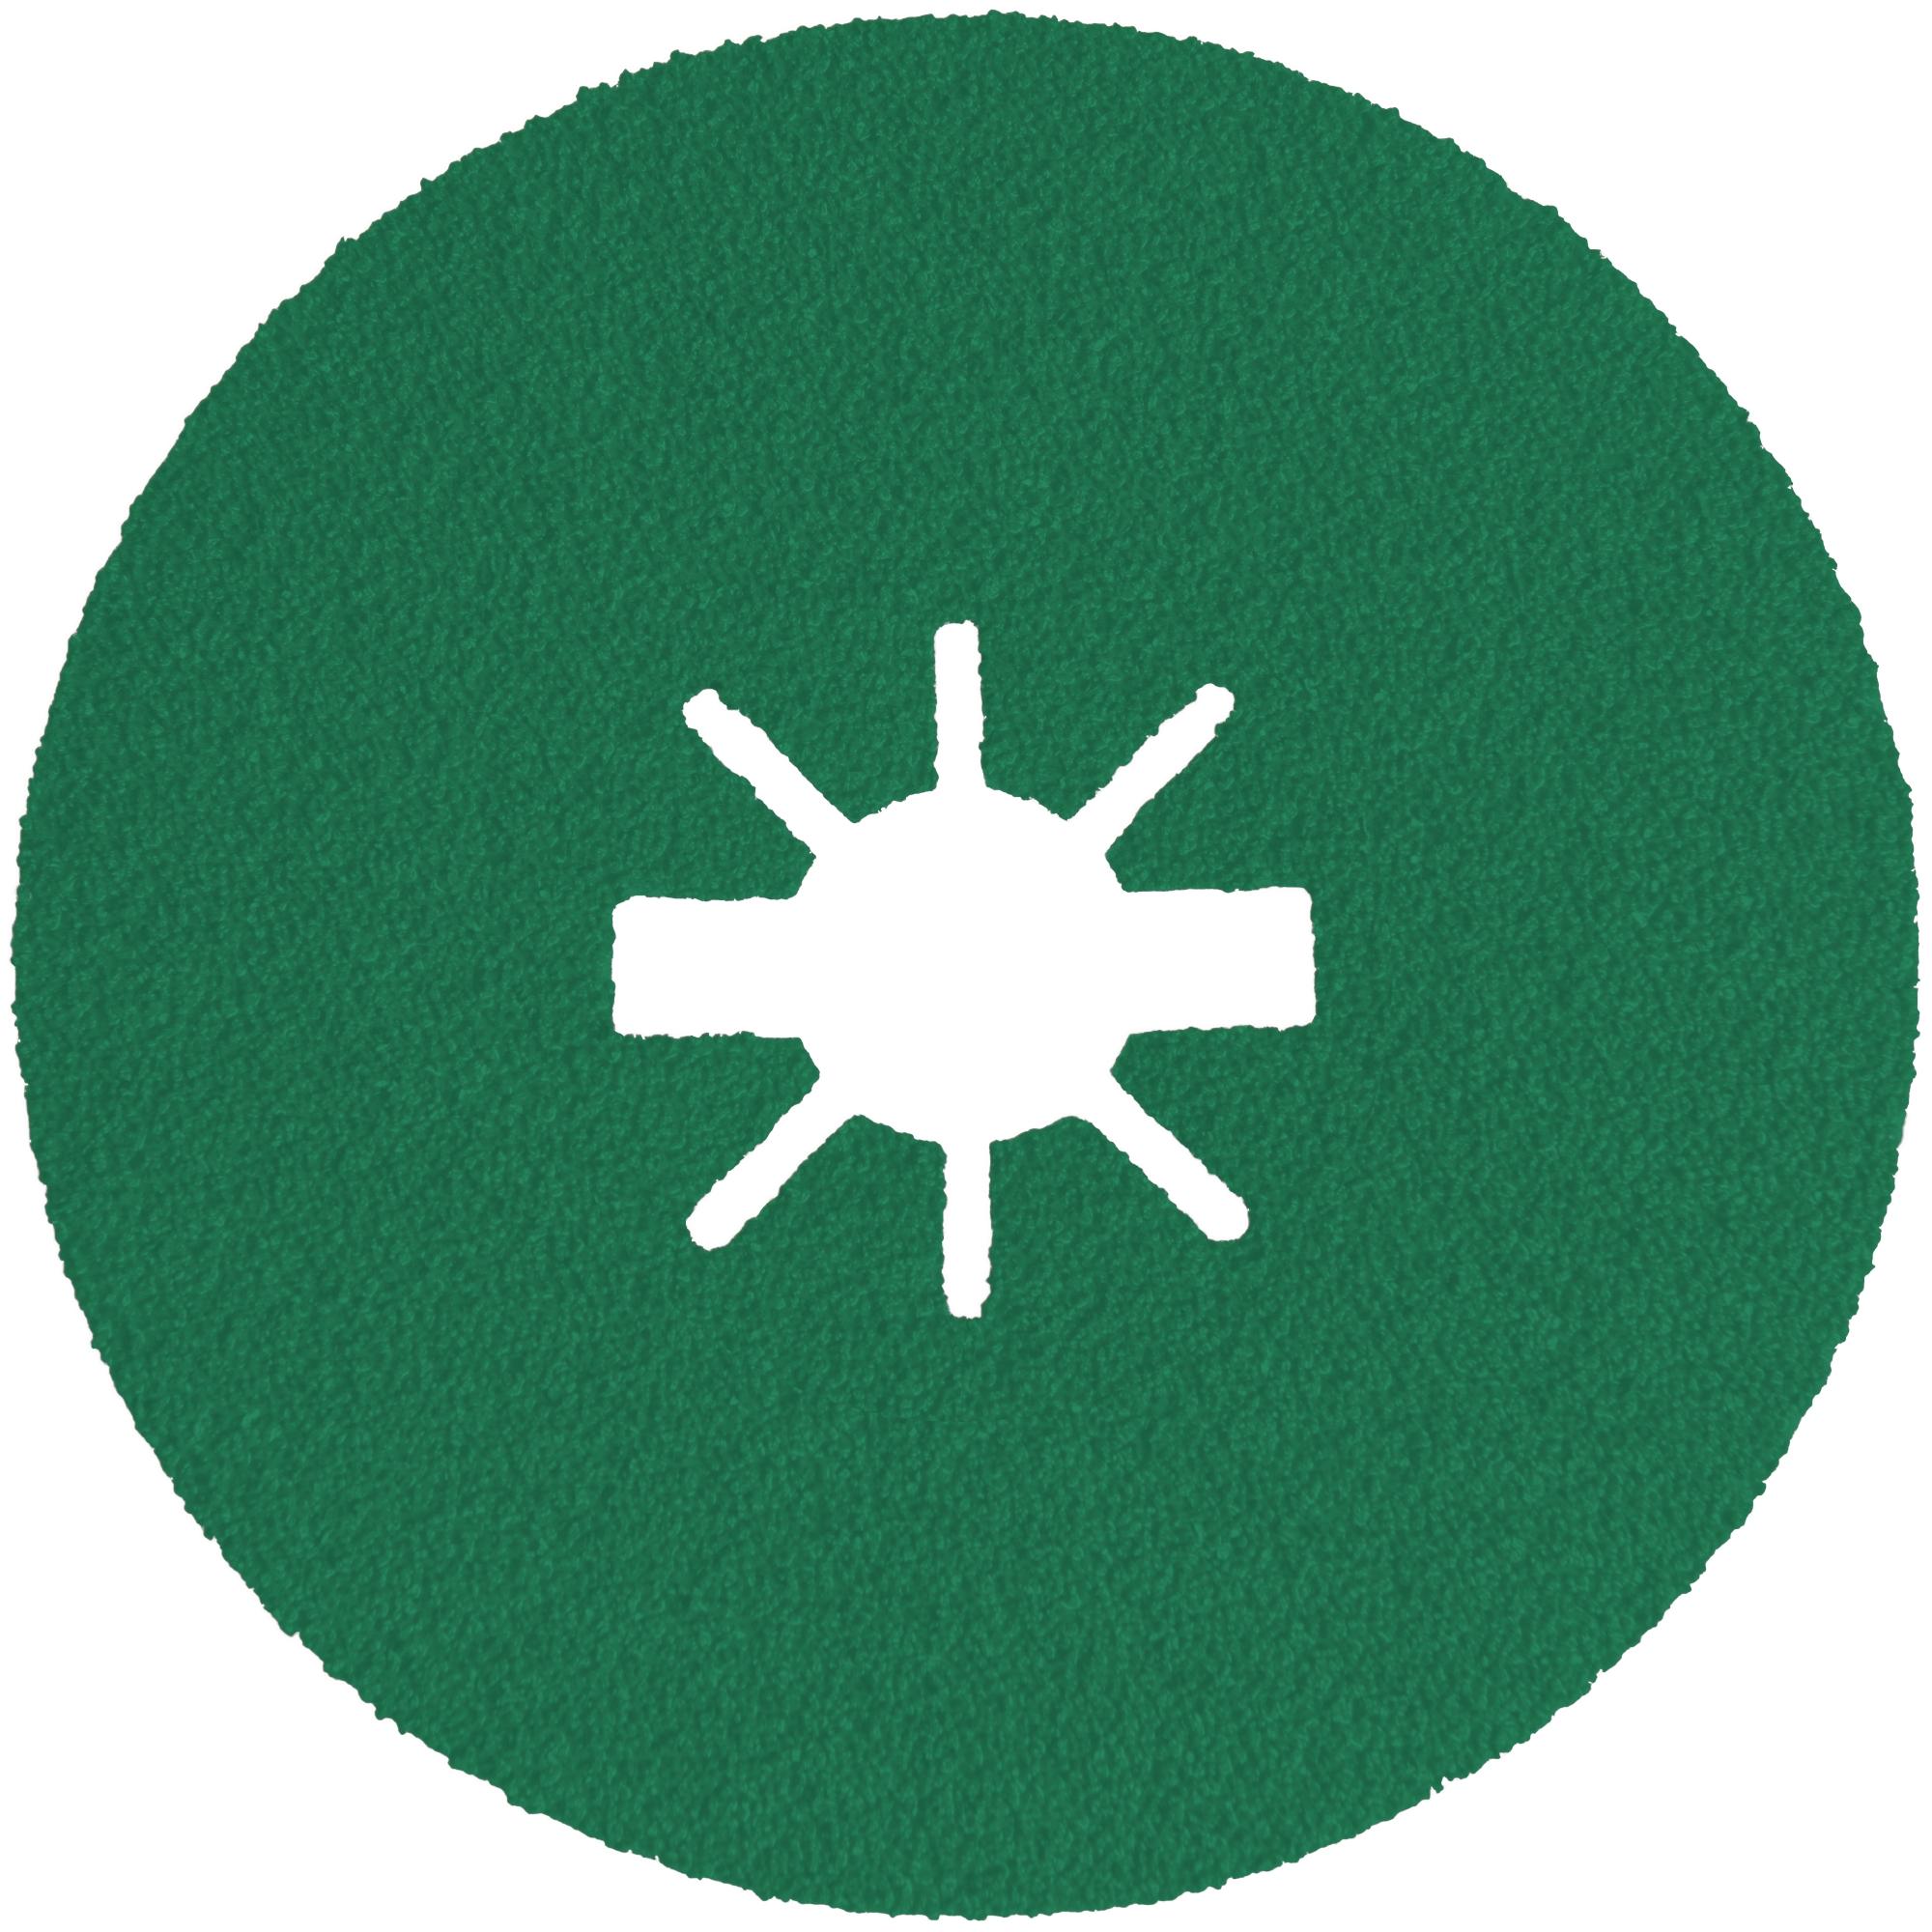 25 x Klingspor FS 966 Fiberscheiben | Multibindung Keramik, 125 x 22 mm | Korn 40 X-LOCK